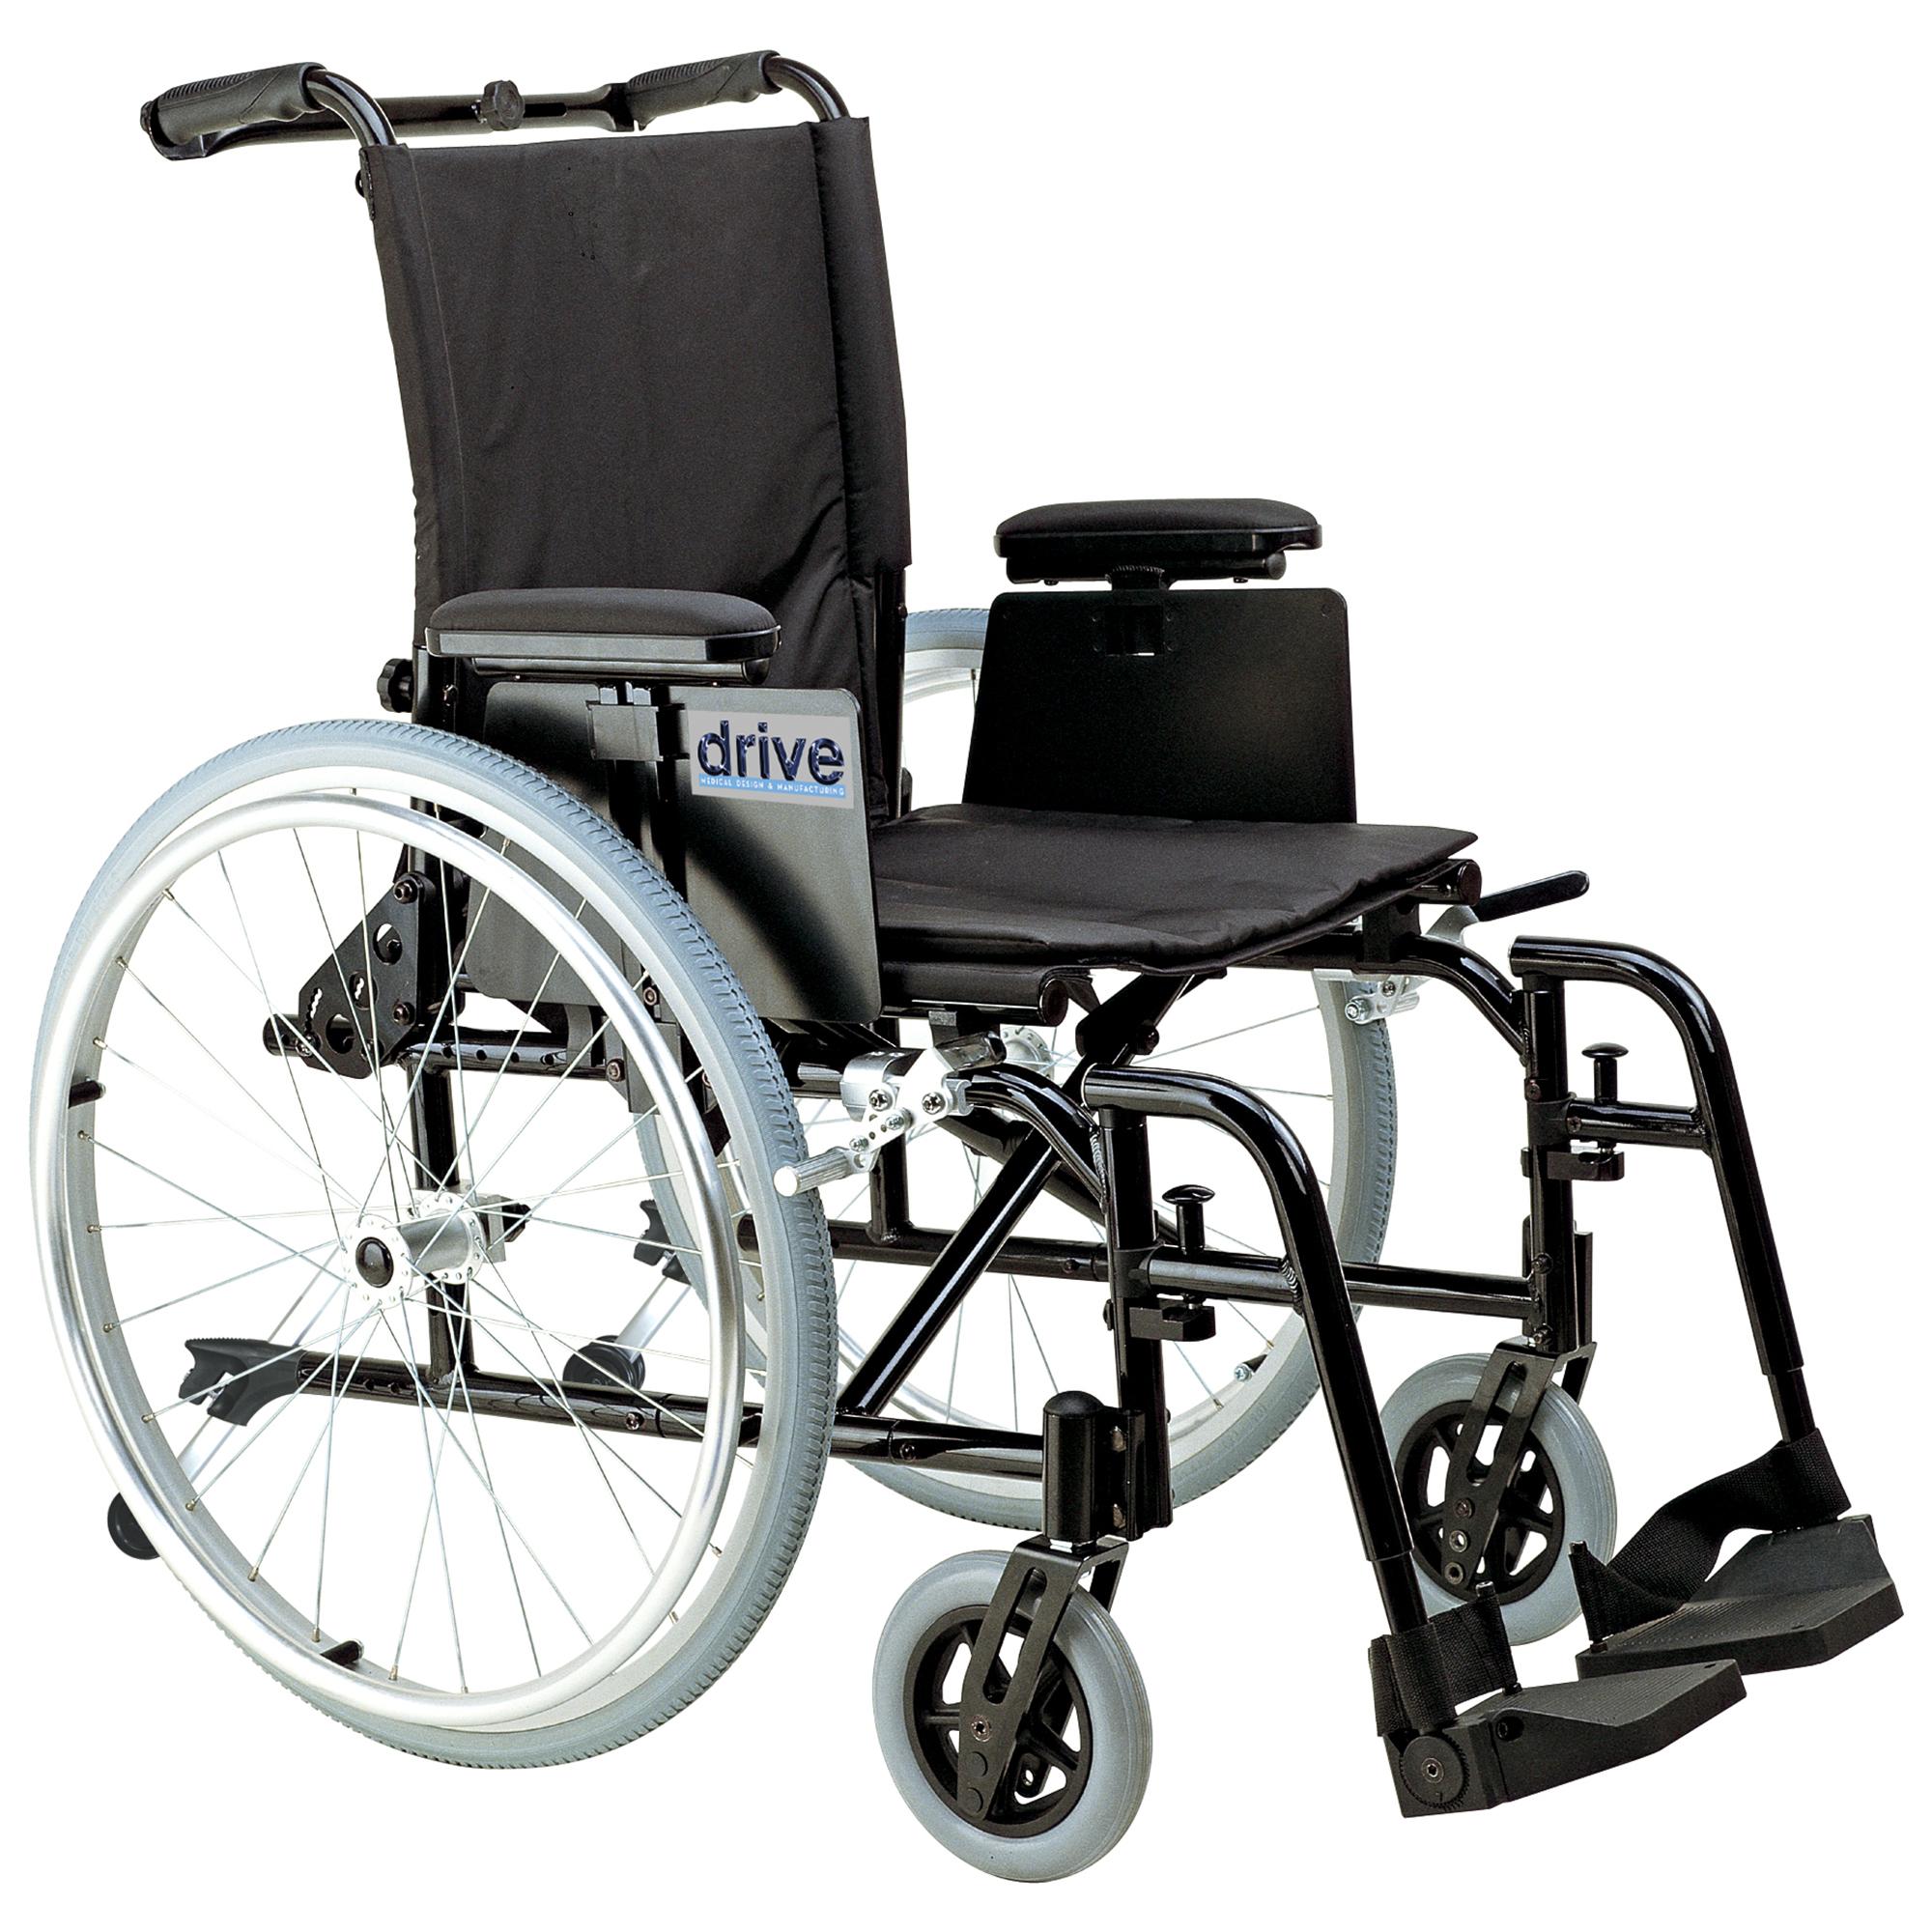 cougar fauteuil roulant en aluminium ultra l ger drive medical fauteuils roulants manuels. Black Bedroom Furniture Sets. Home Design Ideas